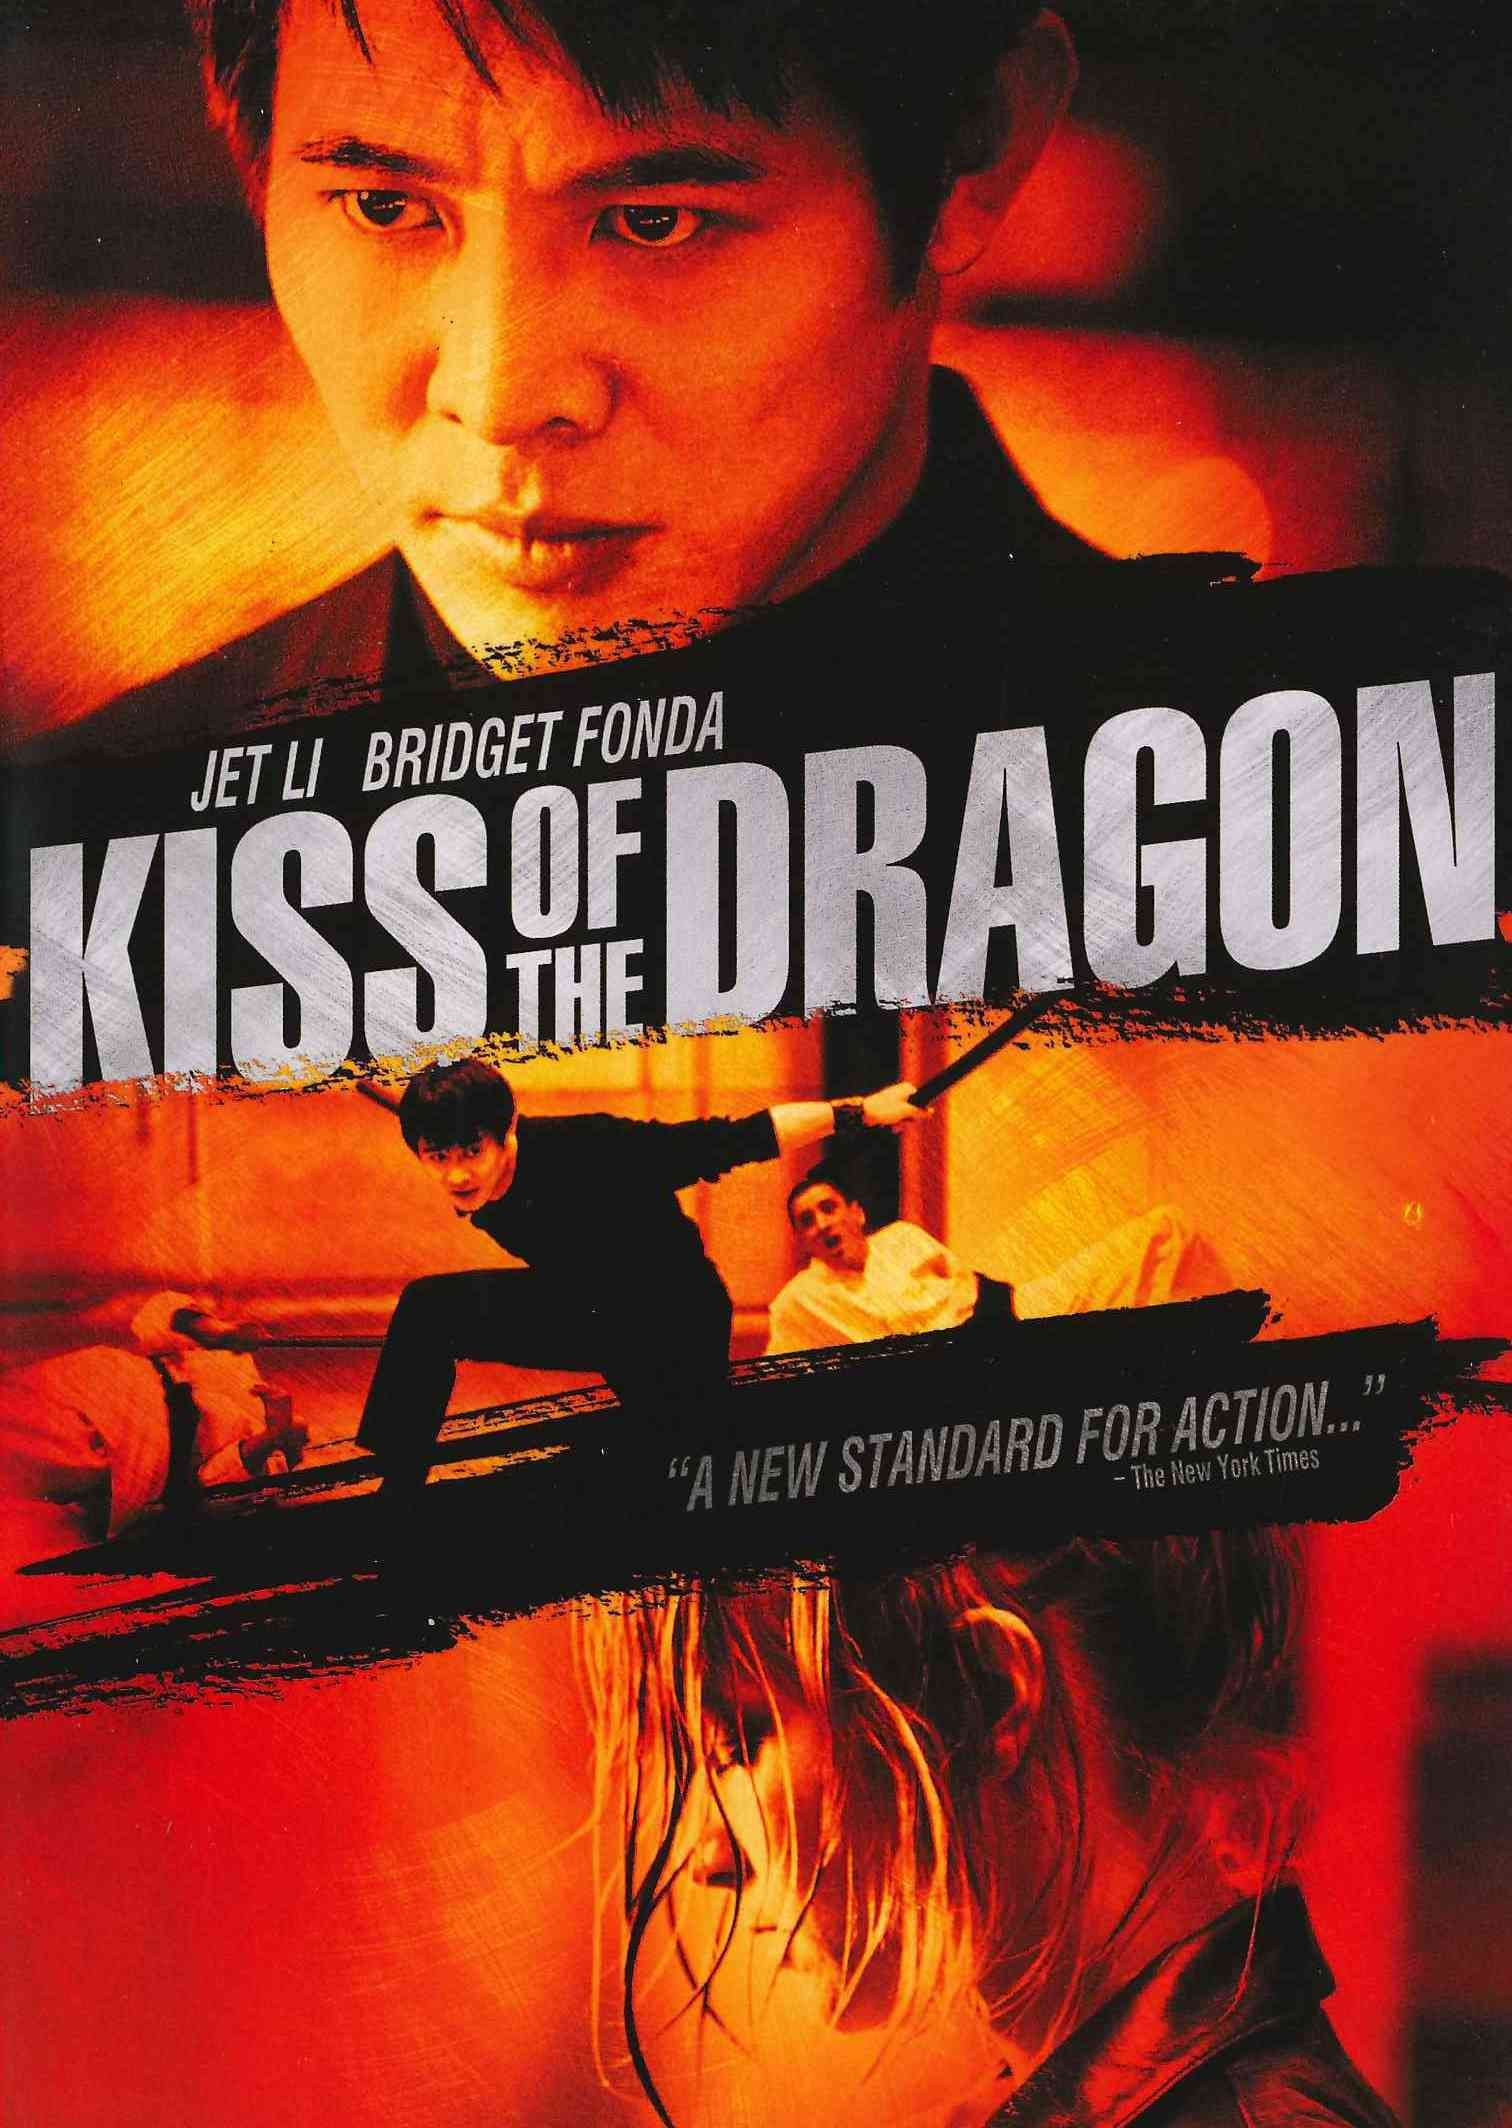 Kiss Of The Dragon | Products | Kiss, Dragon, Hero movie